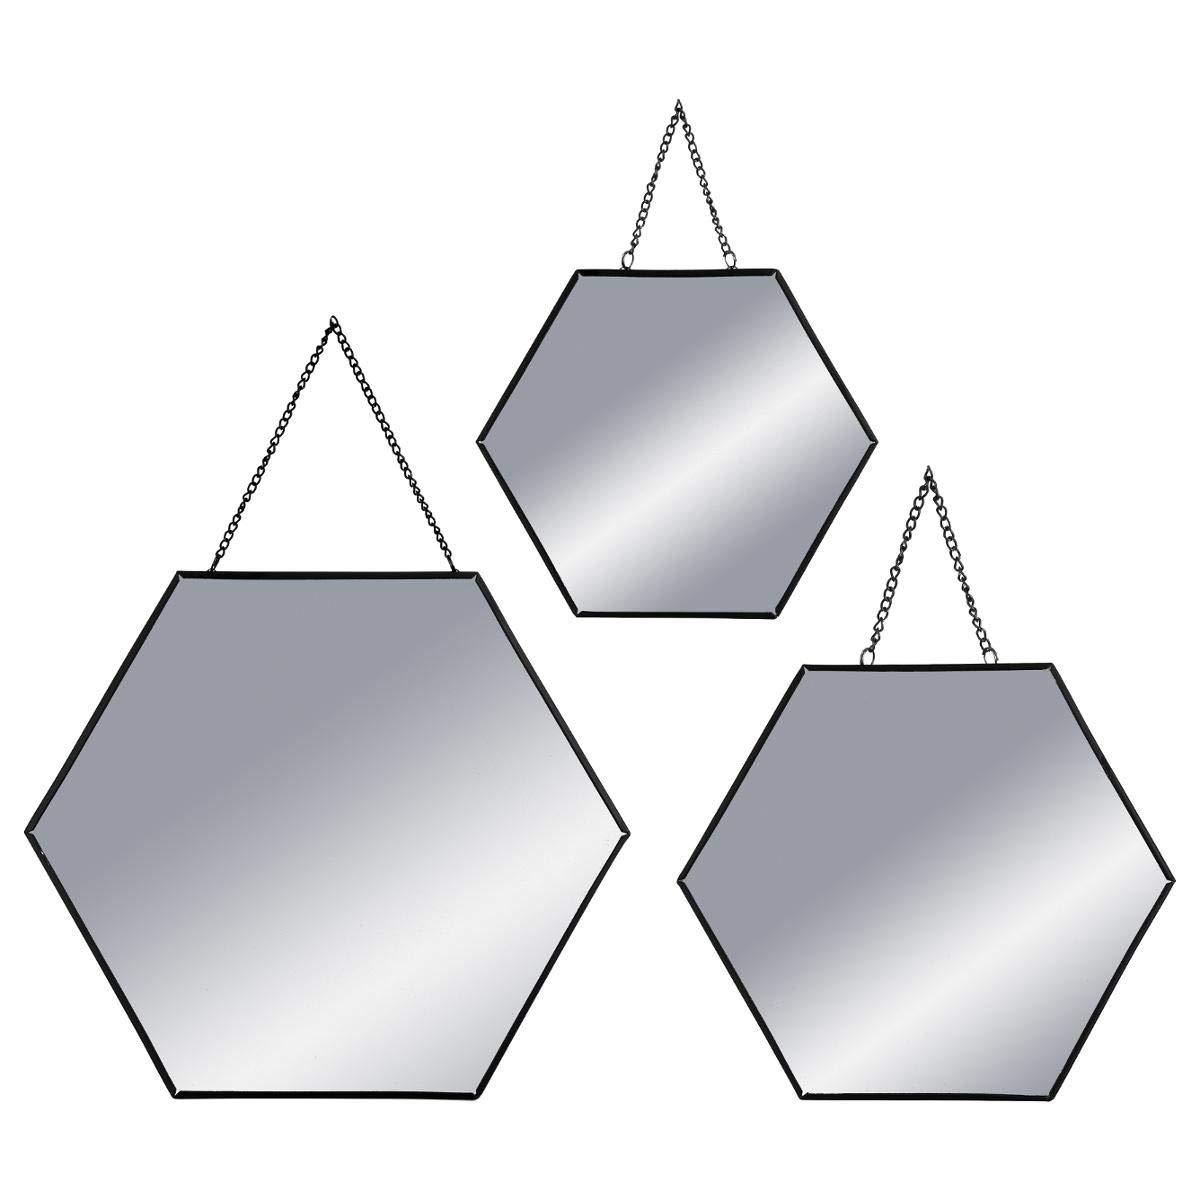 ATMOSPHERA Spiegel Wandspiegel Sechseck Schwarz Metall 3-er Set